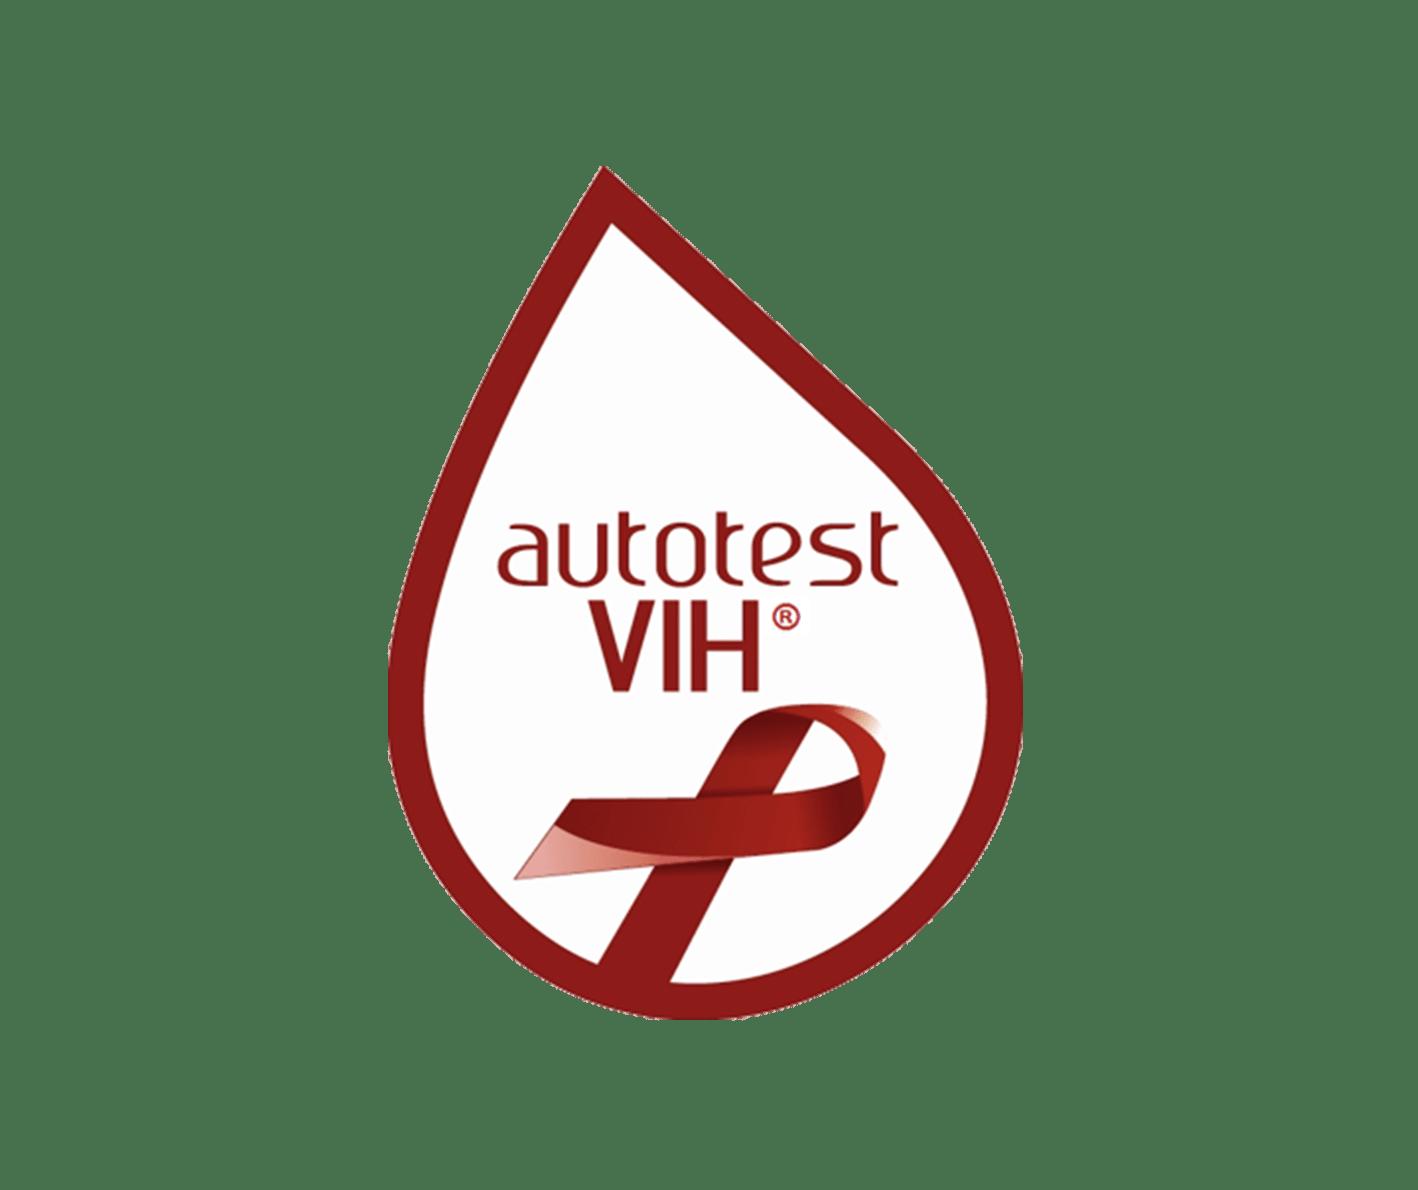 autotest VIH®